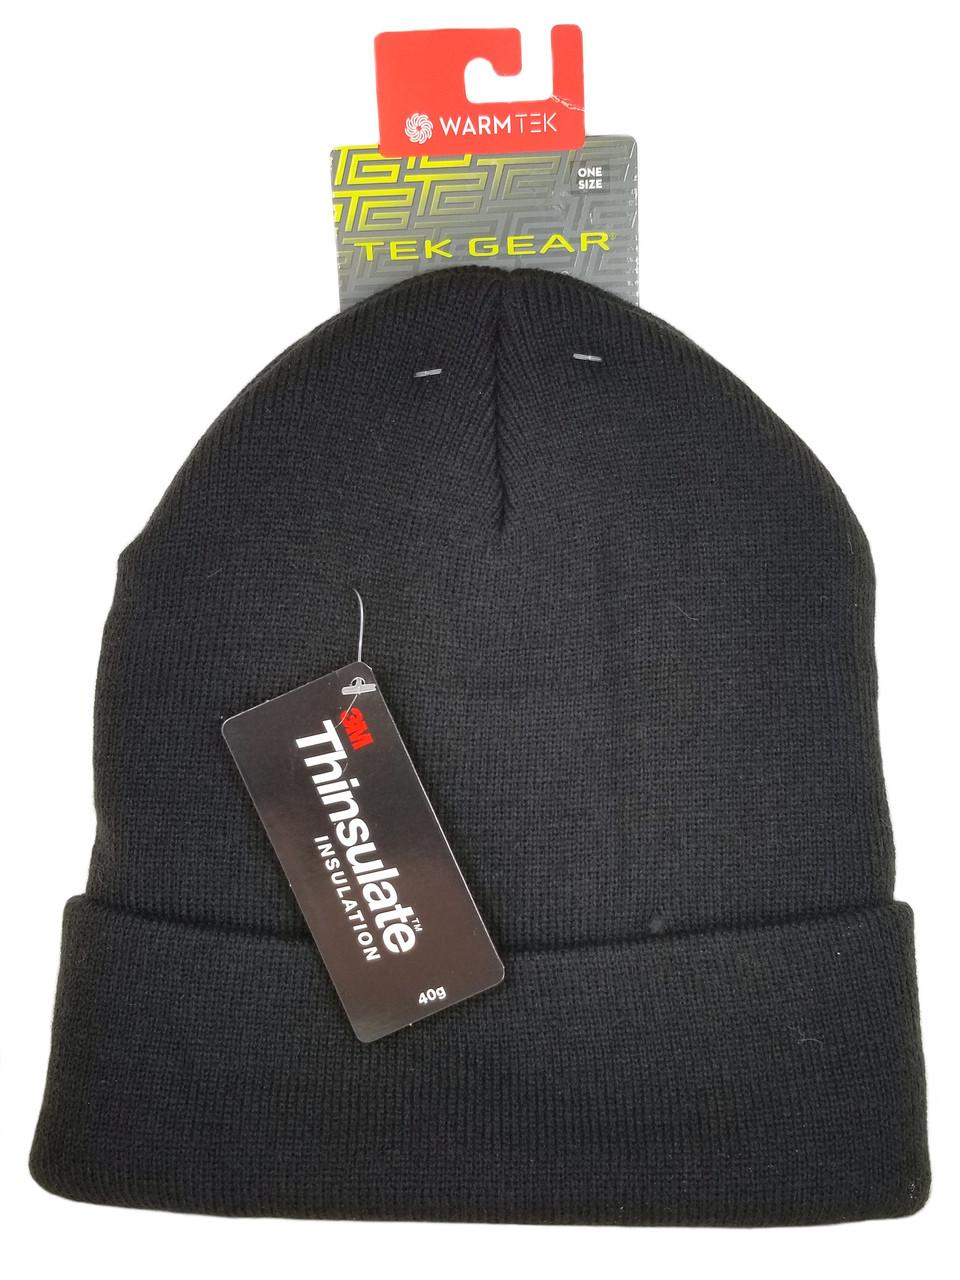 767f6ab8c9a Tek Gear Knit Watchcap Beanie - Black - Black Mountain Supply